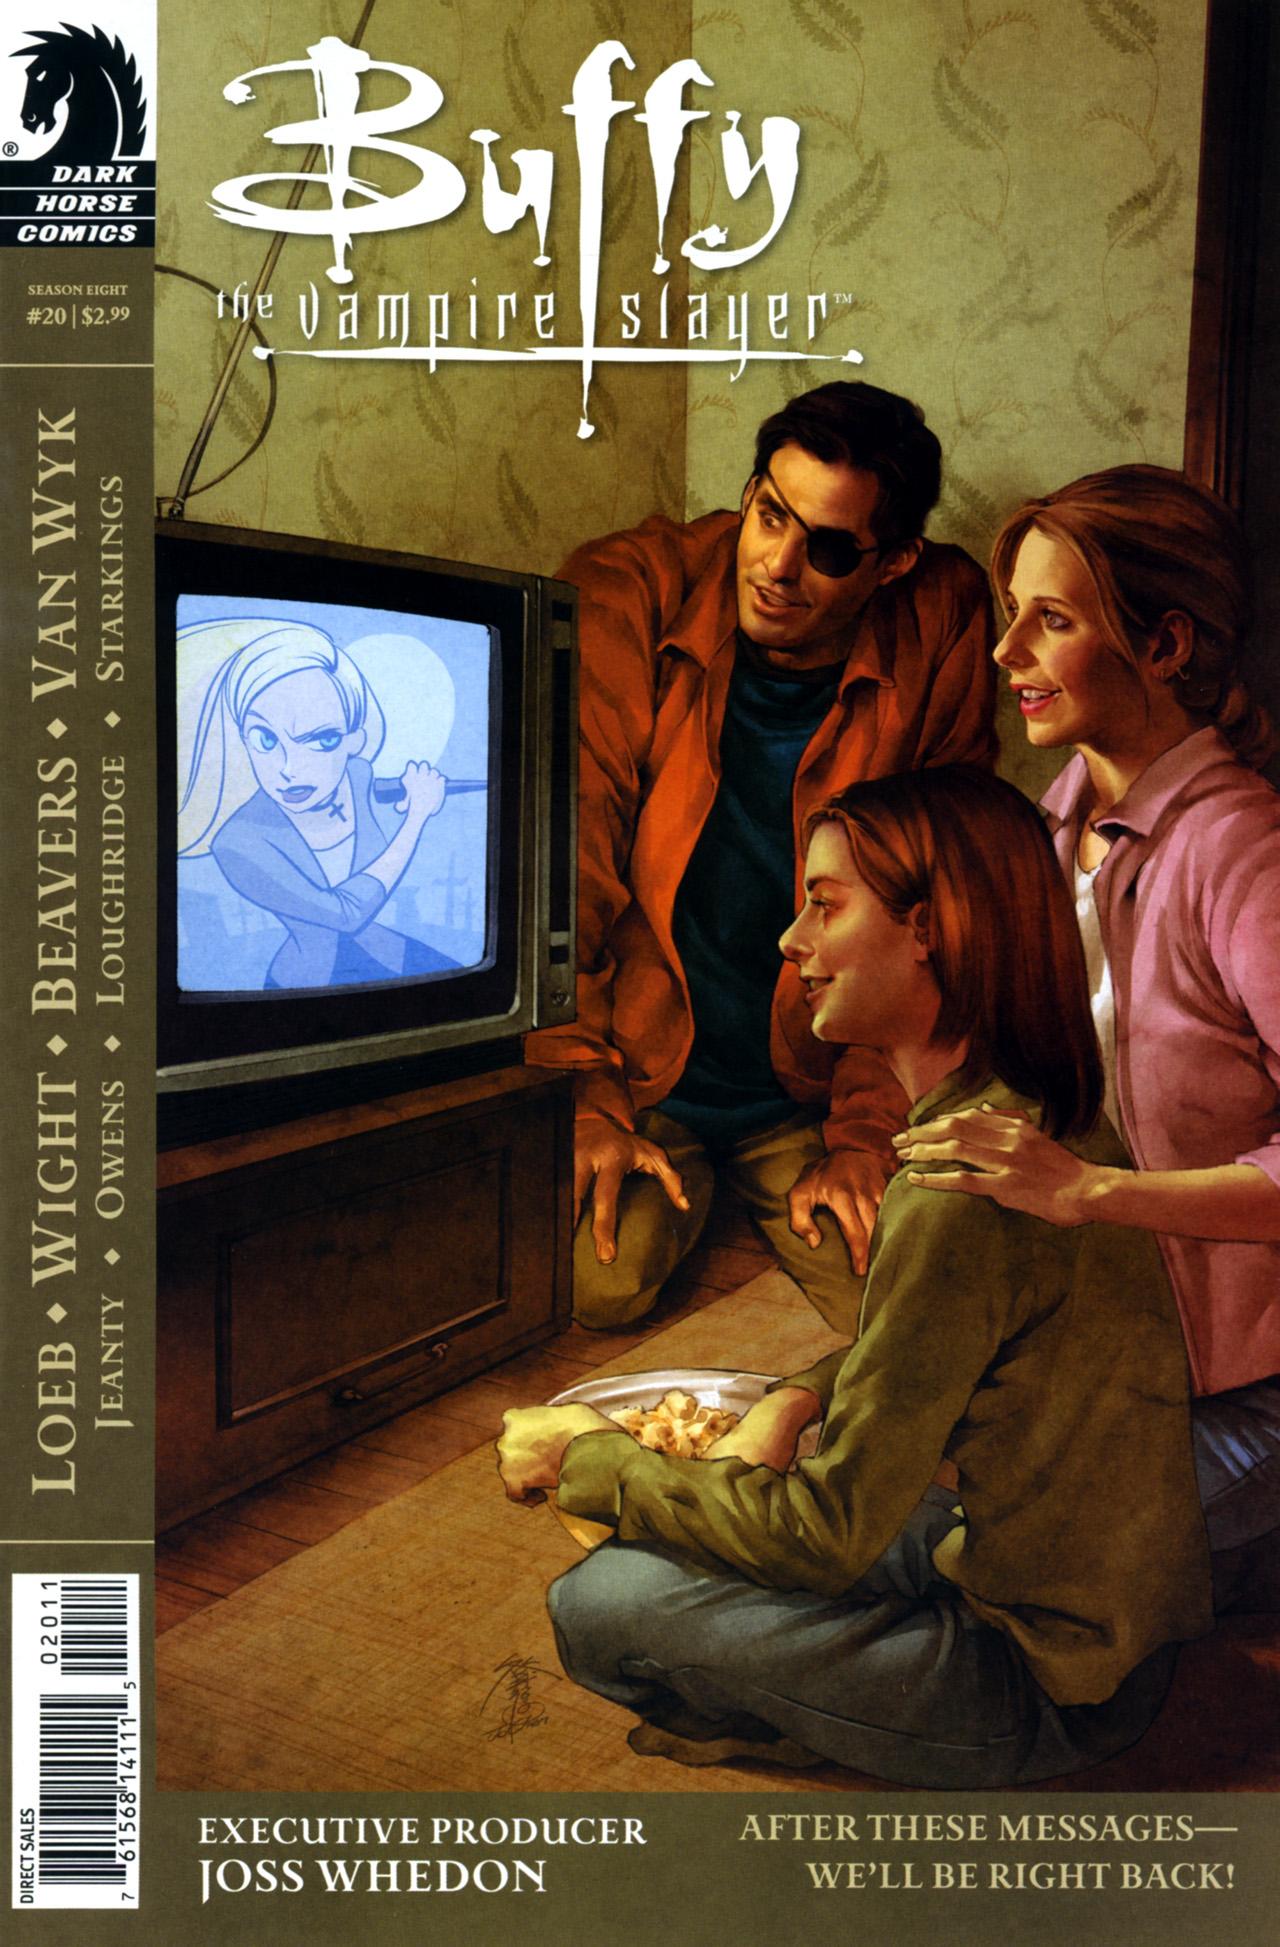 Buffy the Vampire Slayer Season Eight 20 Page 1